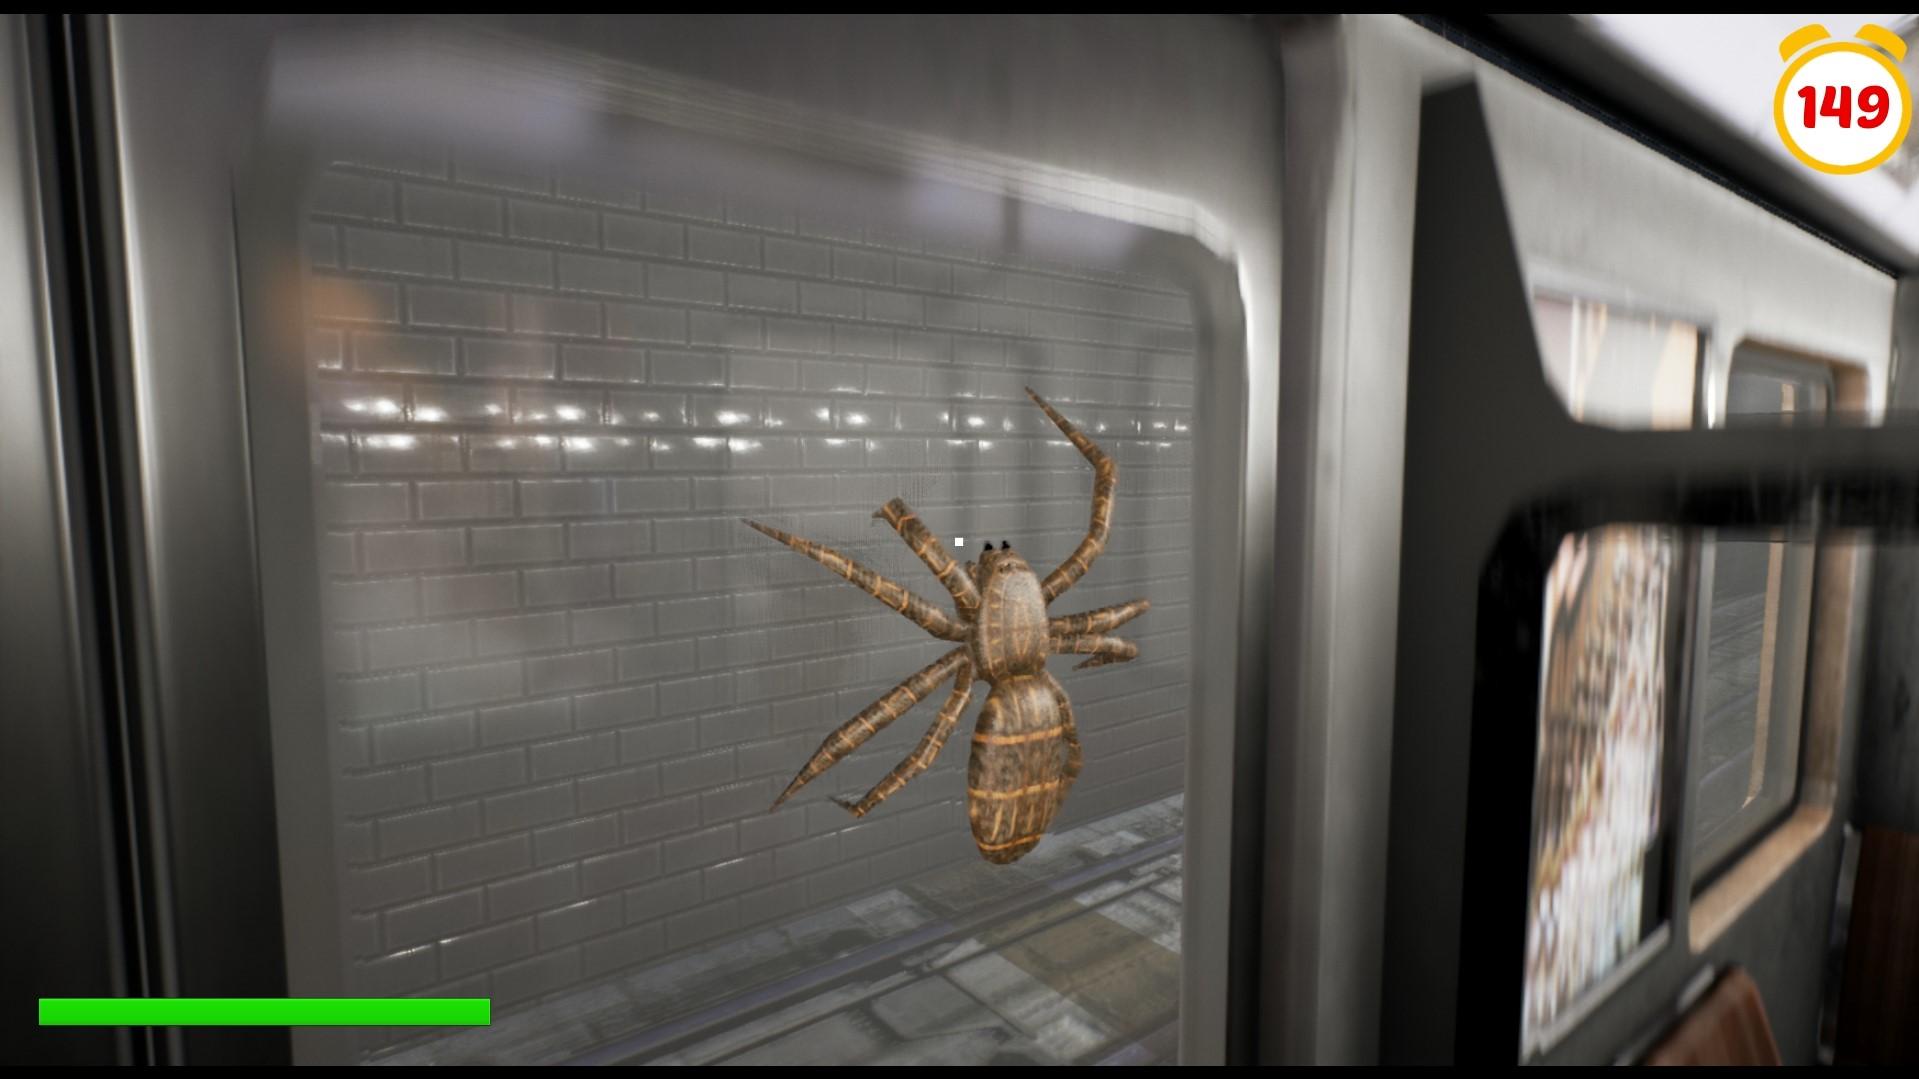 Spider Climbing